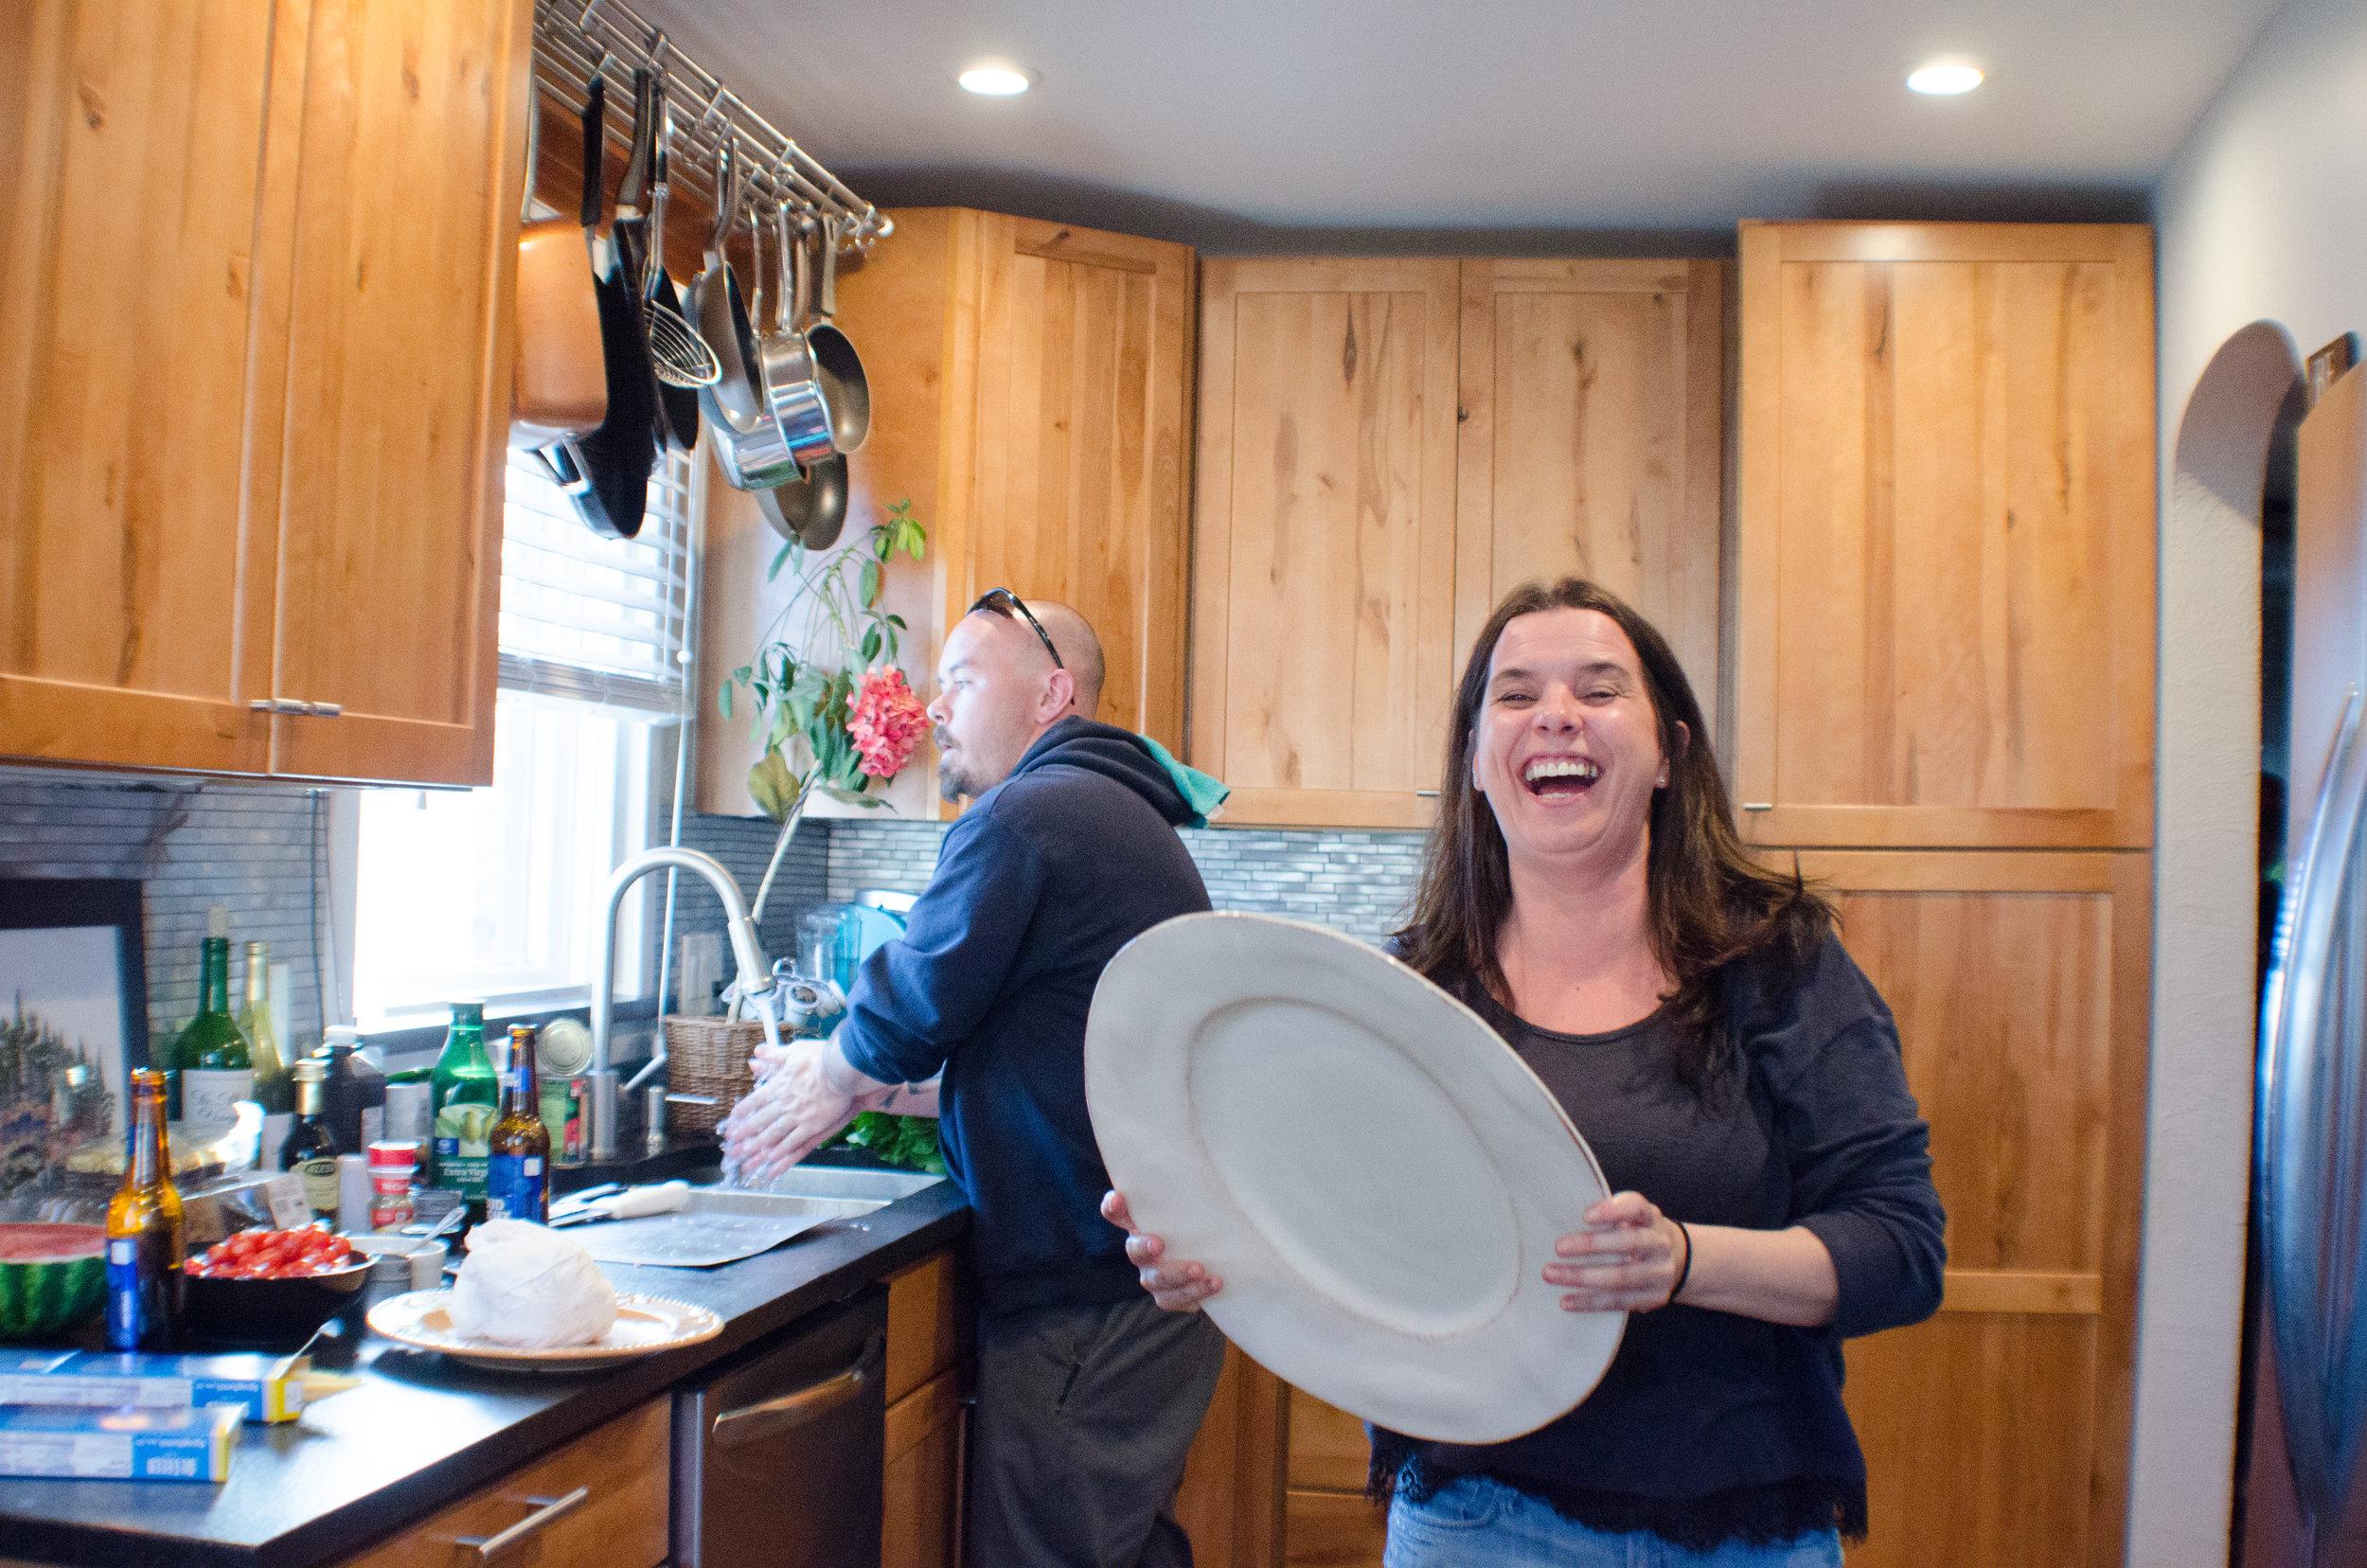 new kitchen, excitement, family love